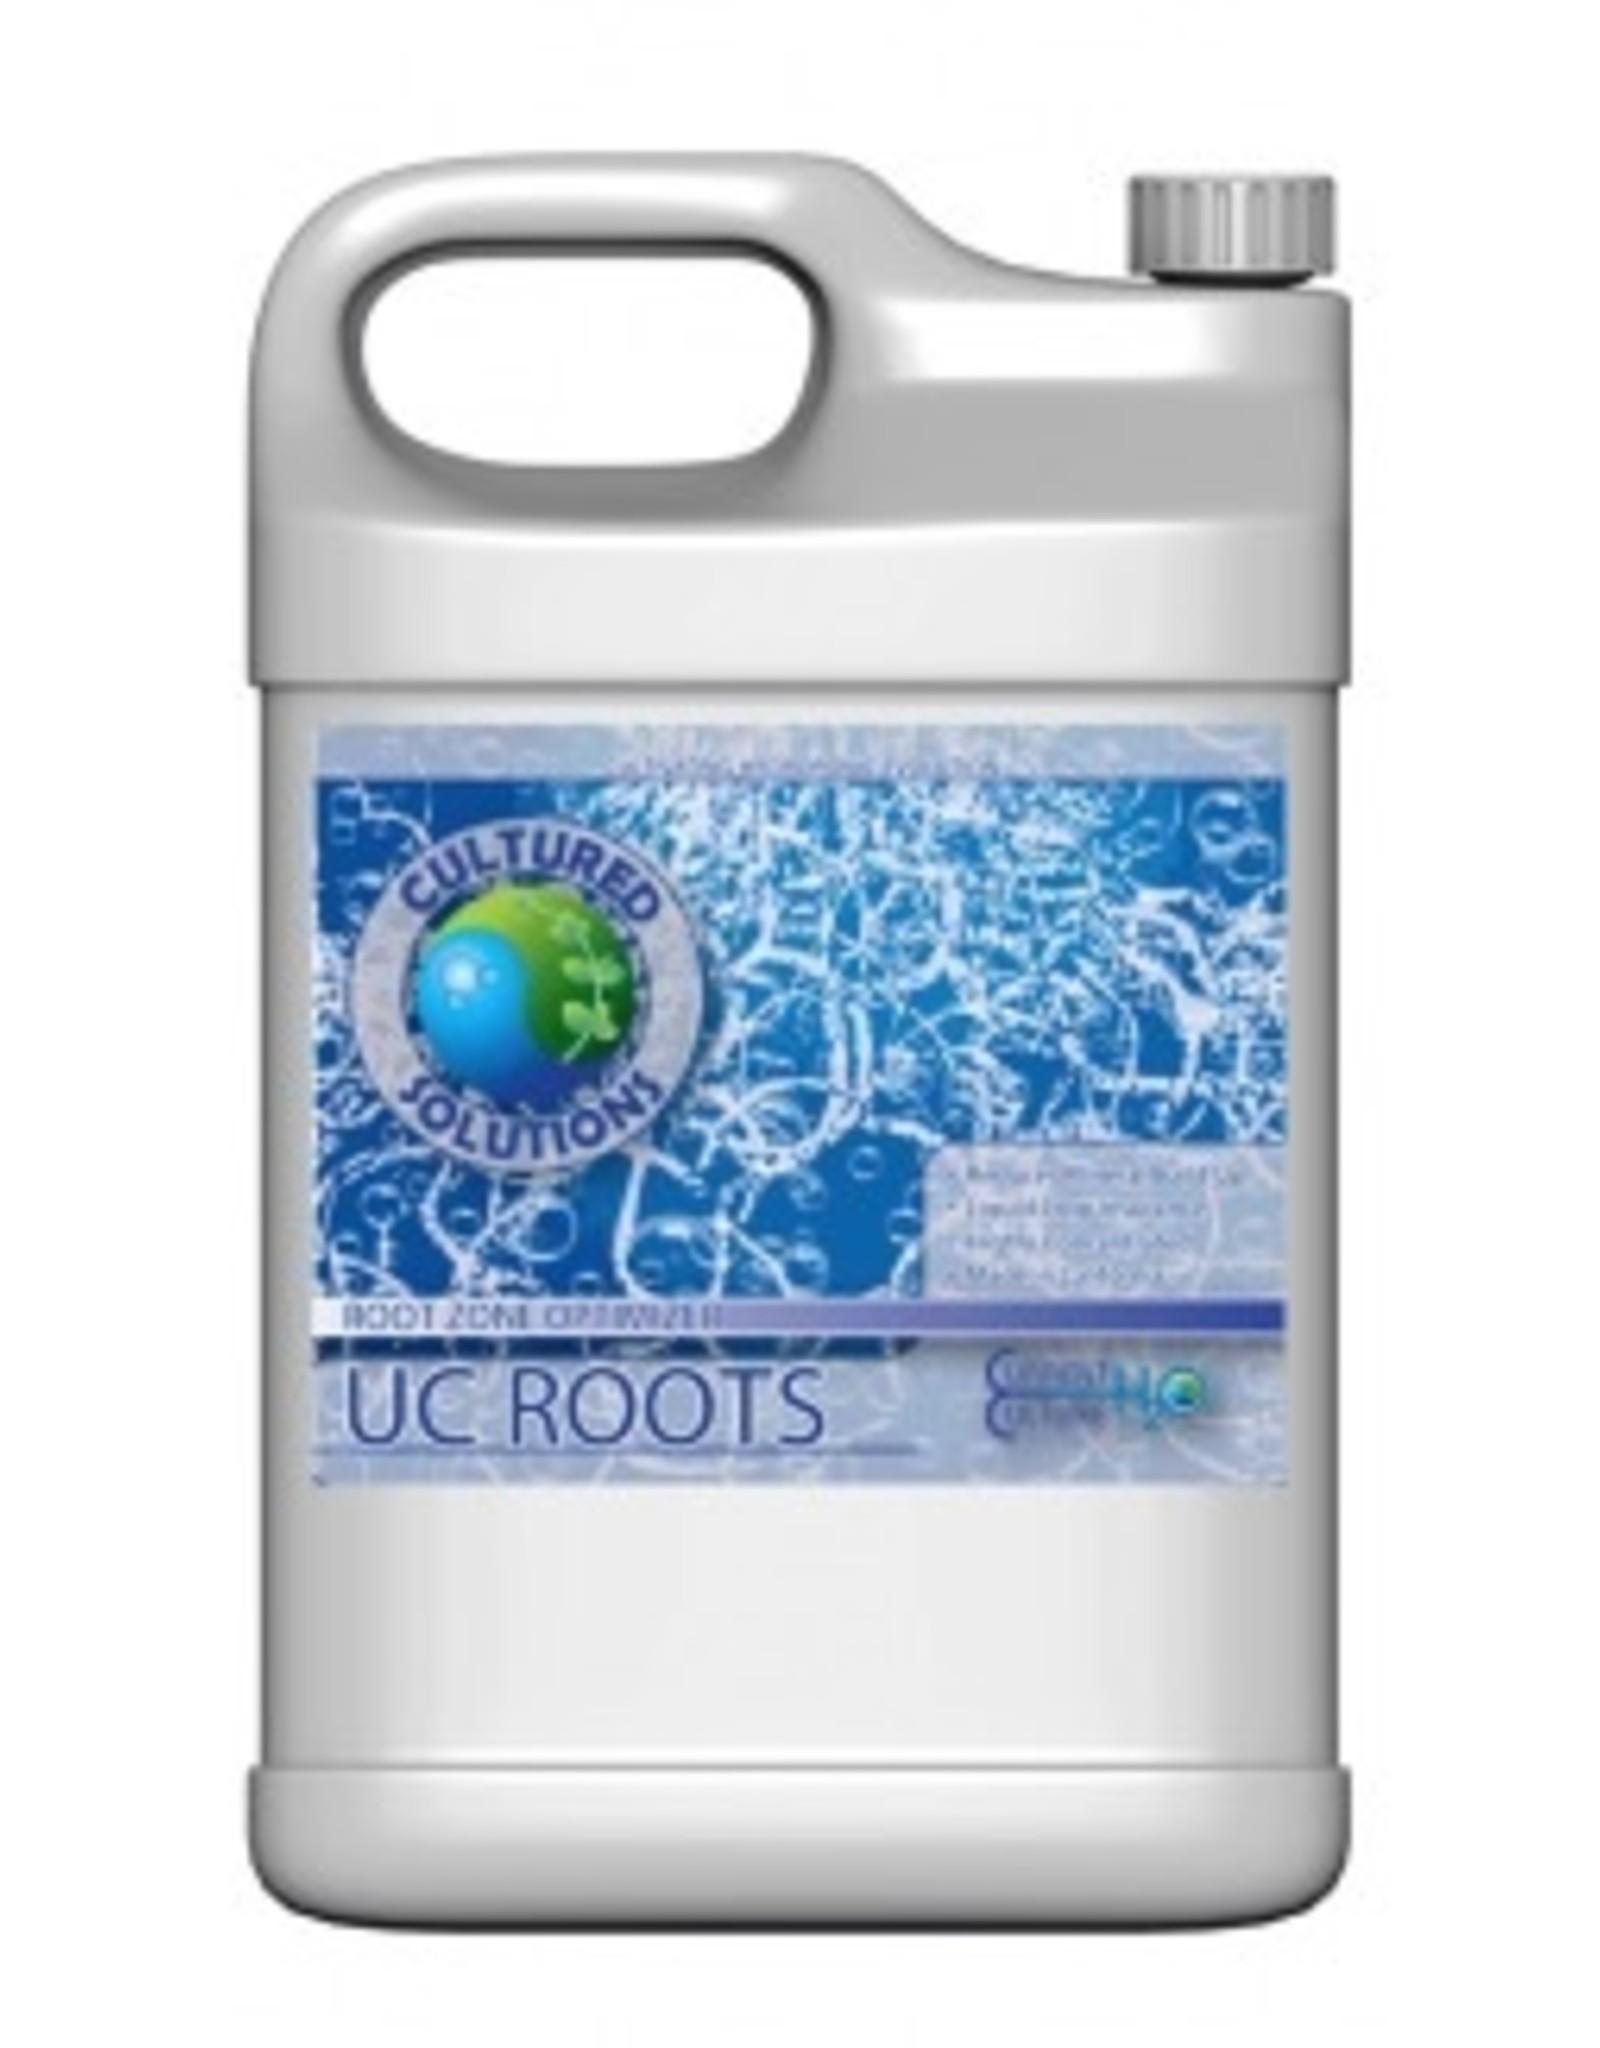 Current Culture H2O CULTURED SOLUTIONS UC ROOTS GAL